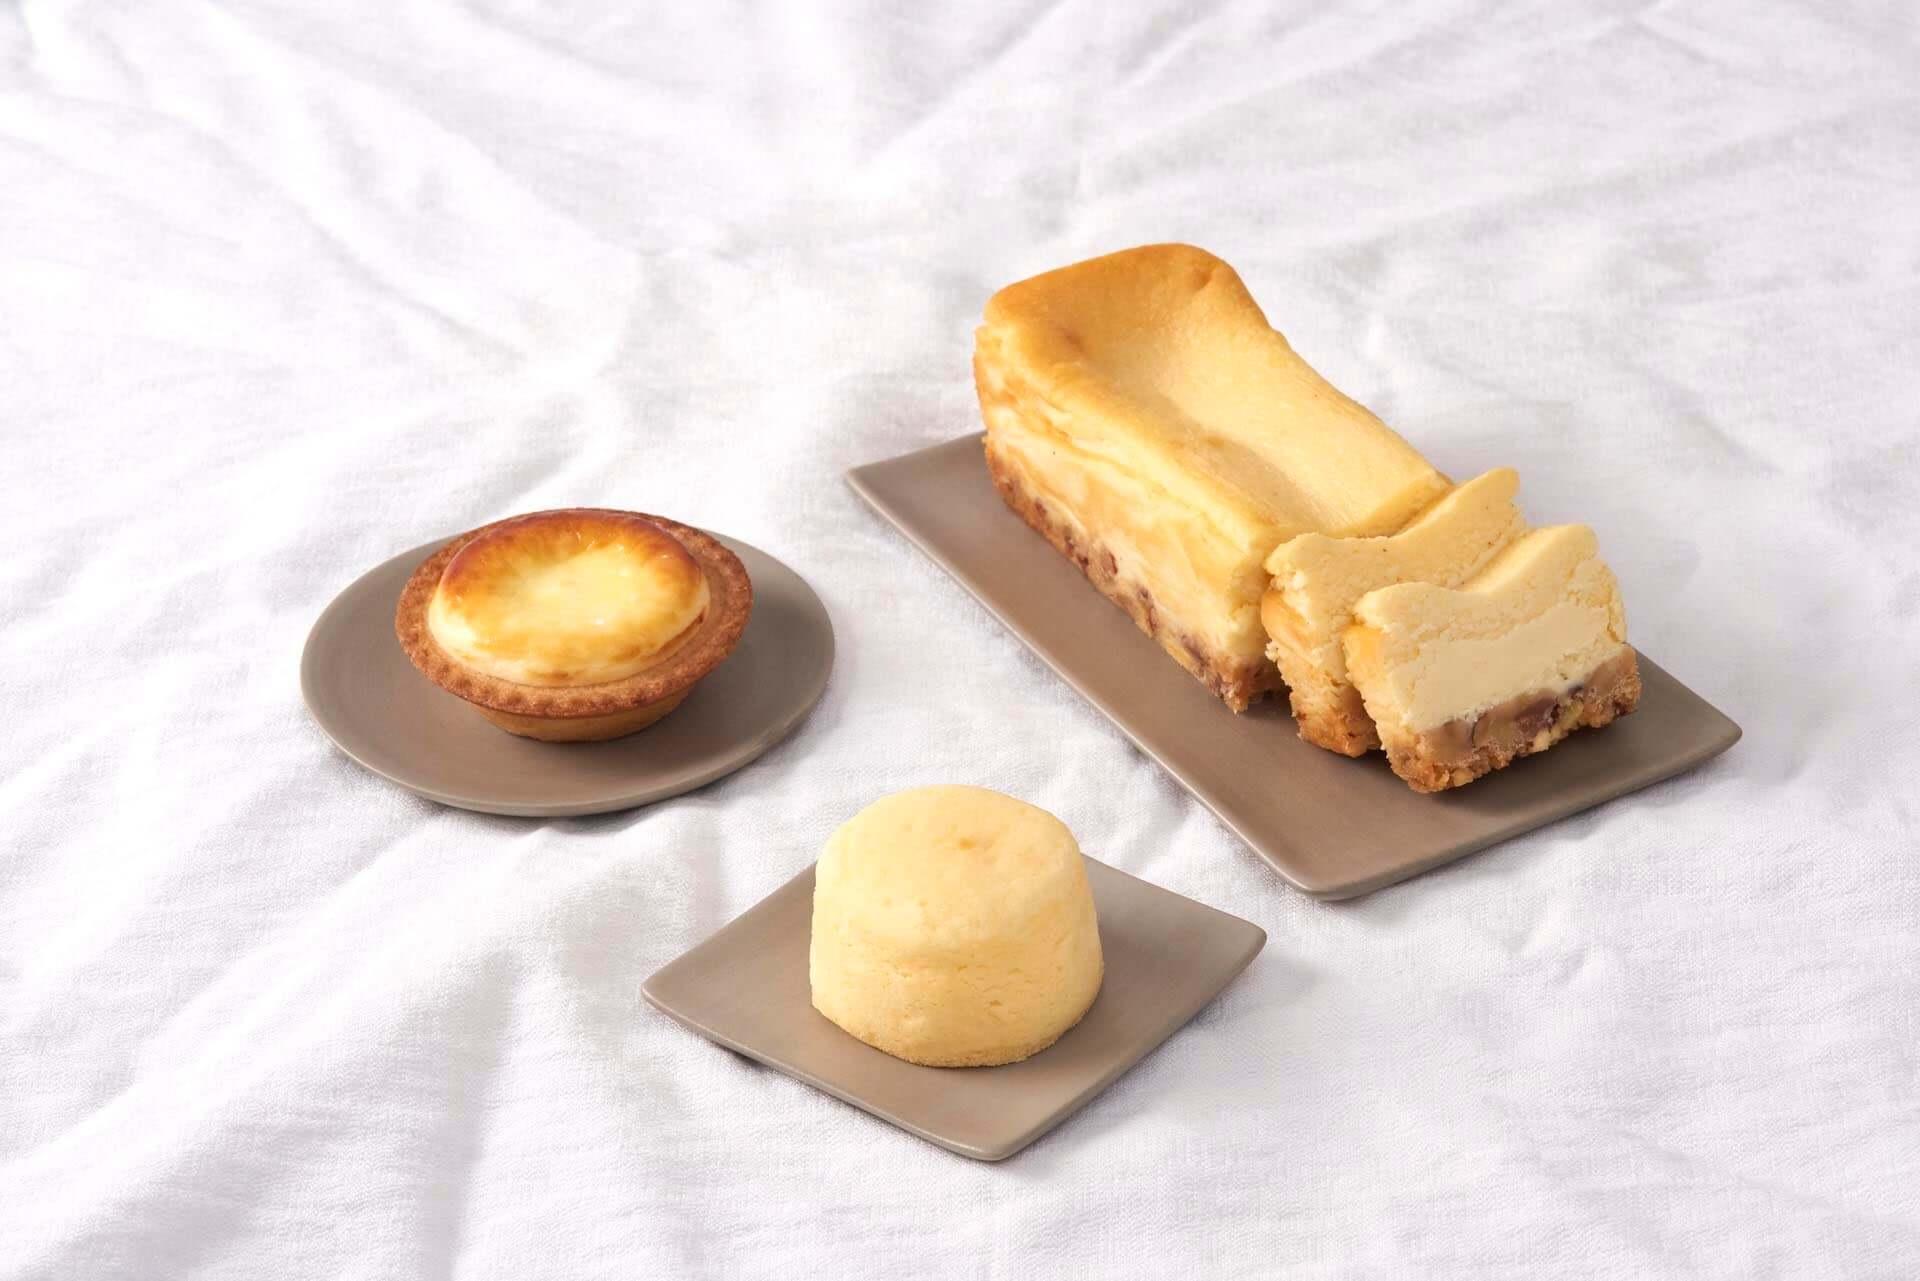 BAKEが濃厚なチーズテリーヌ主軸の新ブランド「THE CHEESE TERRINE by BAKE CHEESE TART」をローンチ!数量限定で予約受付開始 gourmet201201_bake-cheese-tart_3-1920x1281